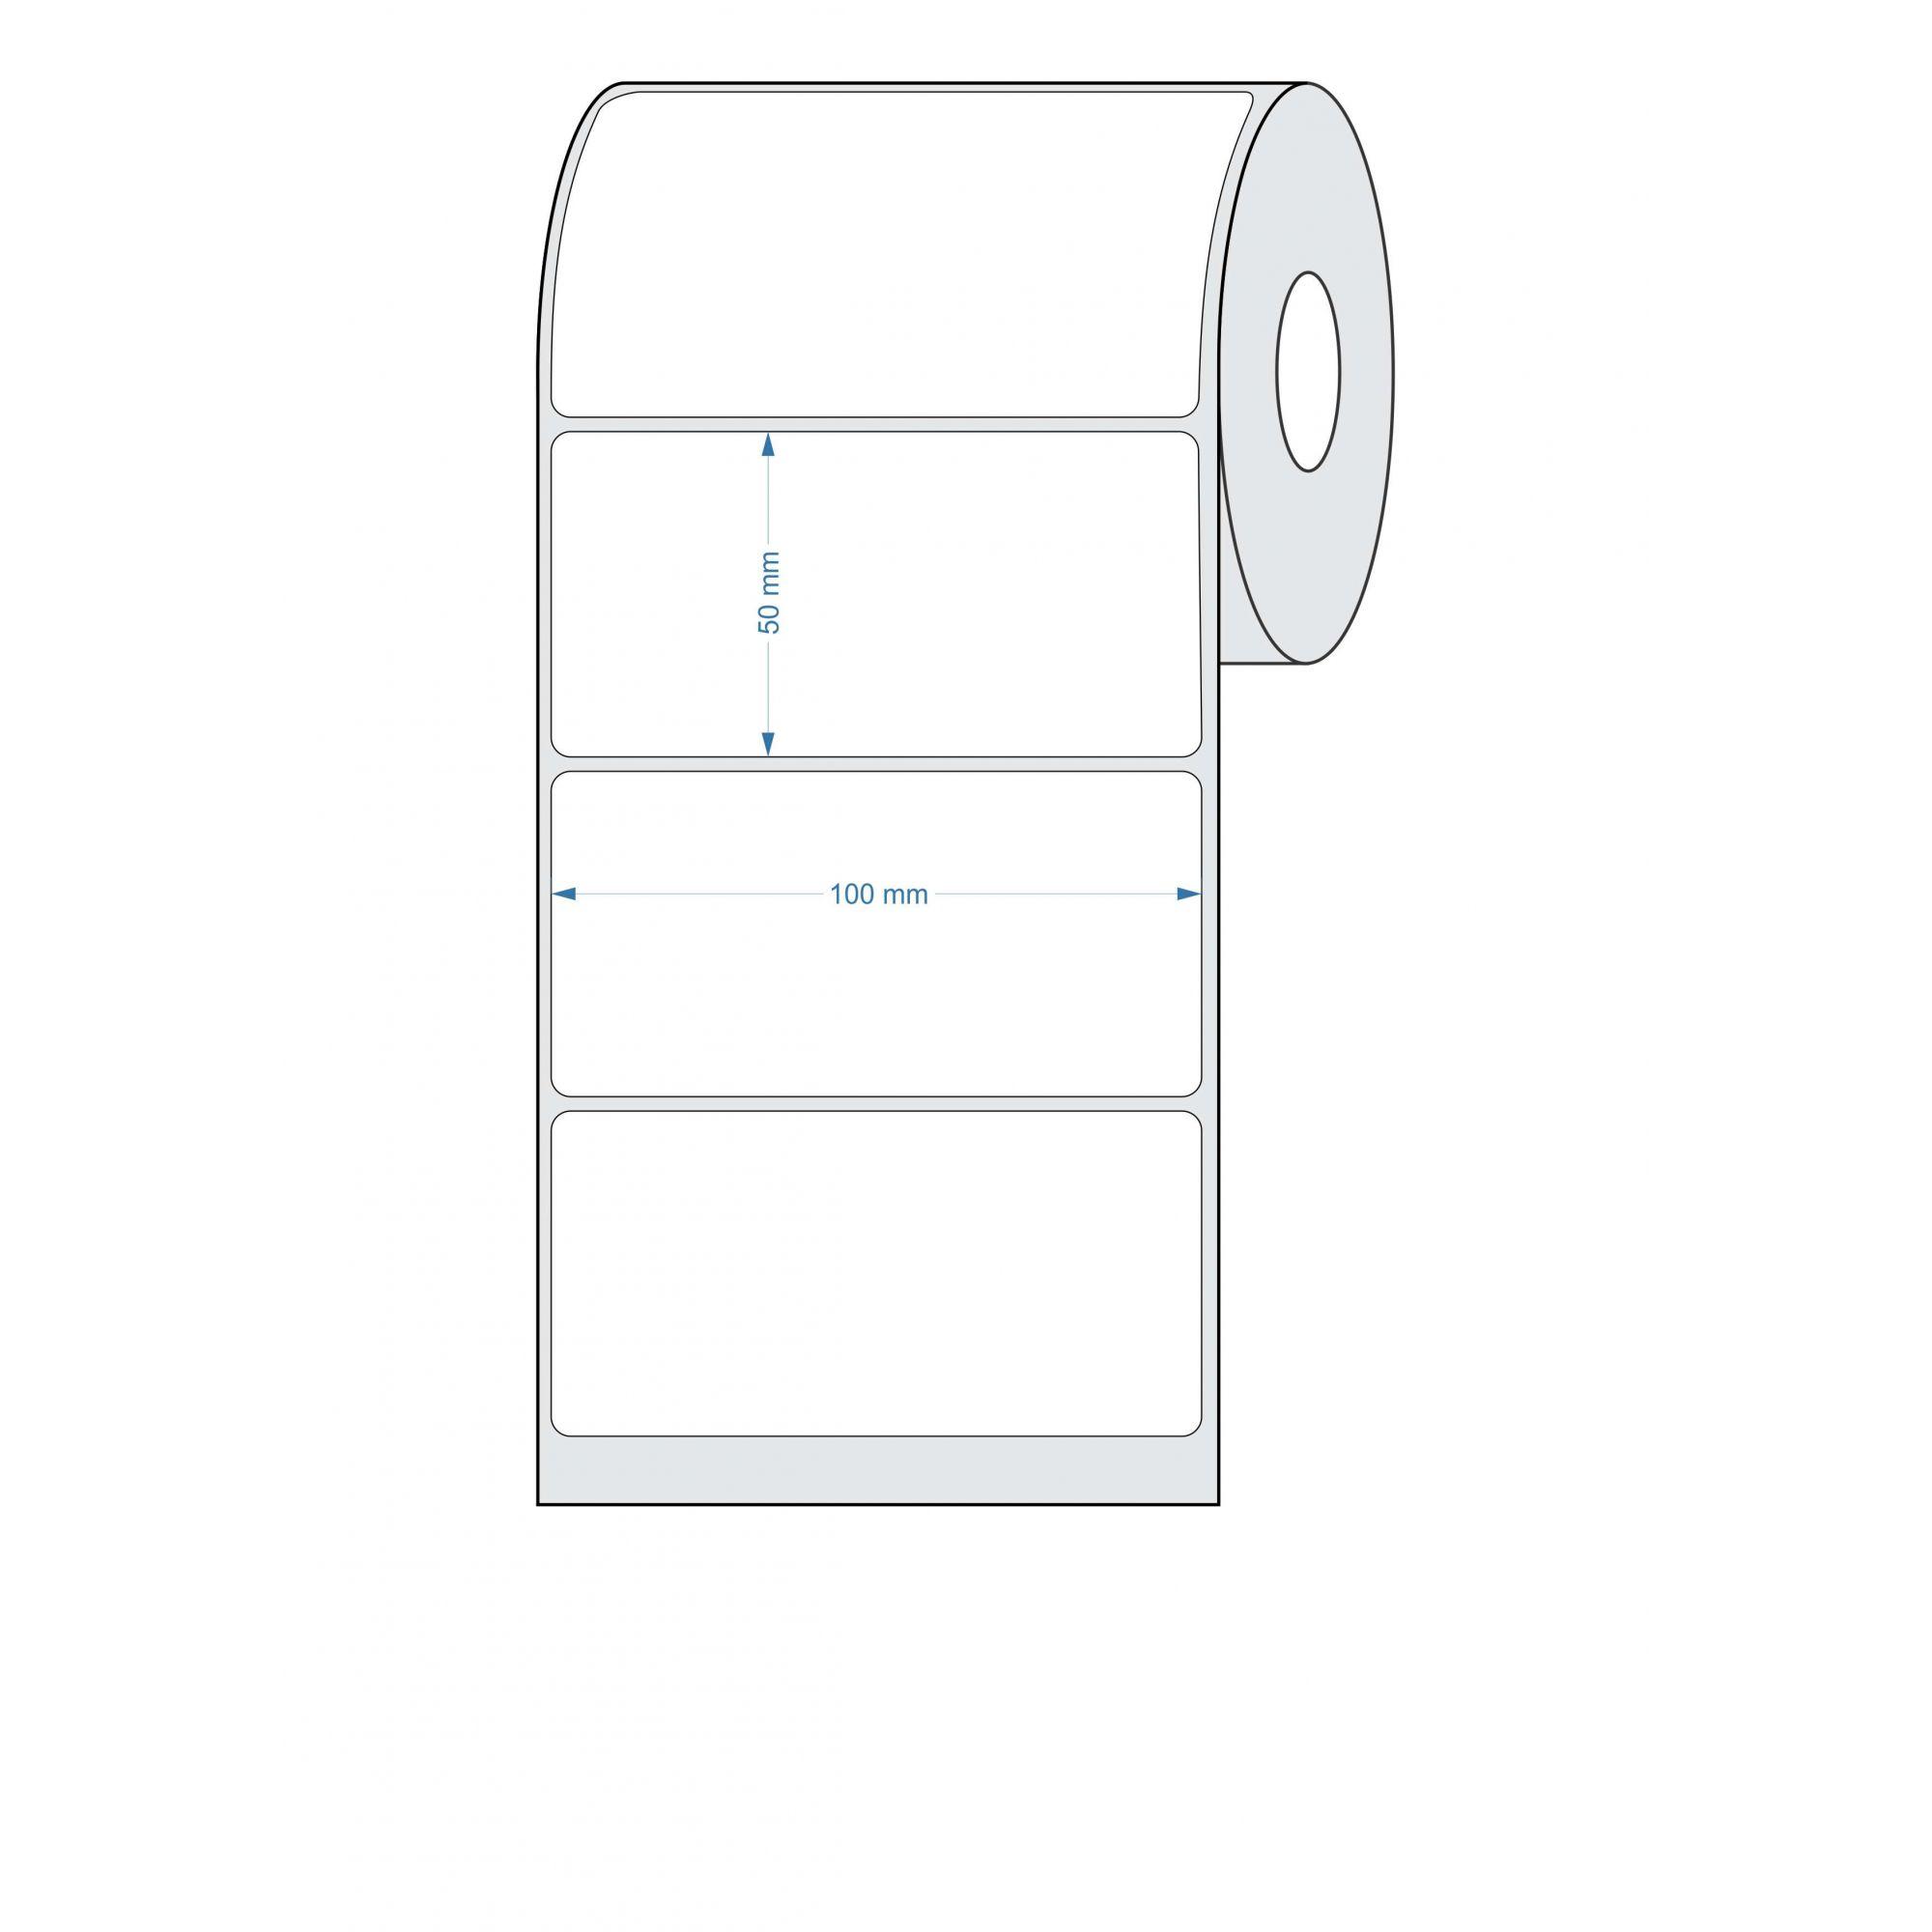 5 Rolos Etiquetas Adesivas Térmica 100x50 Mm 32 Metros